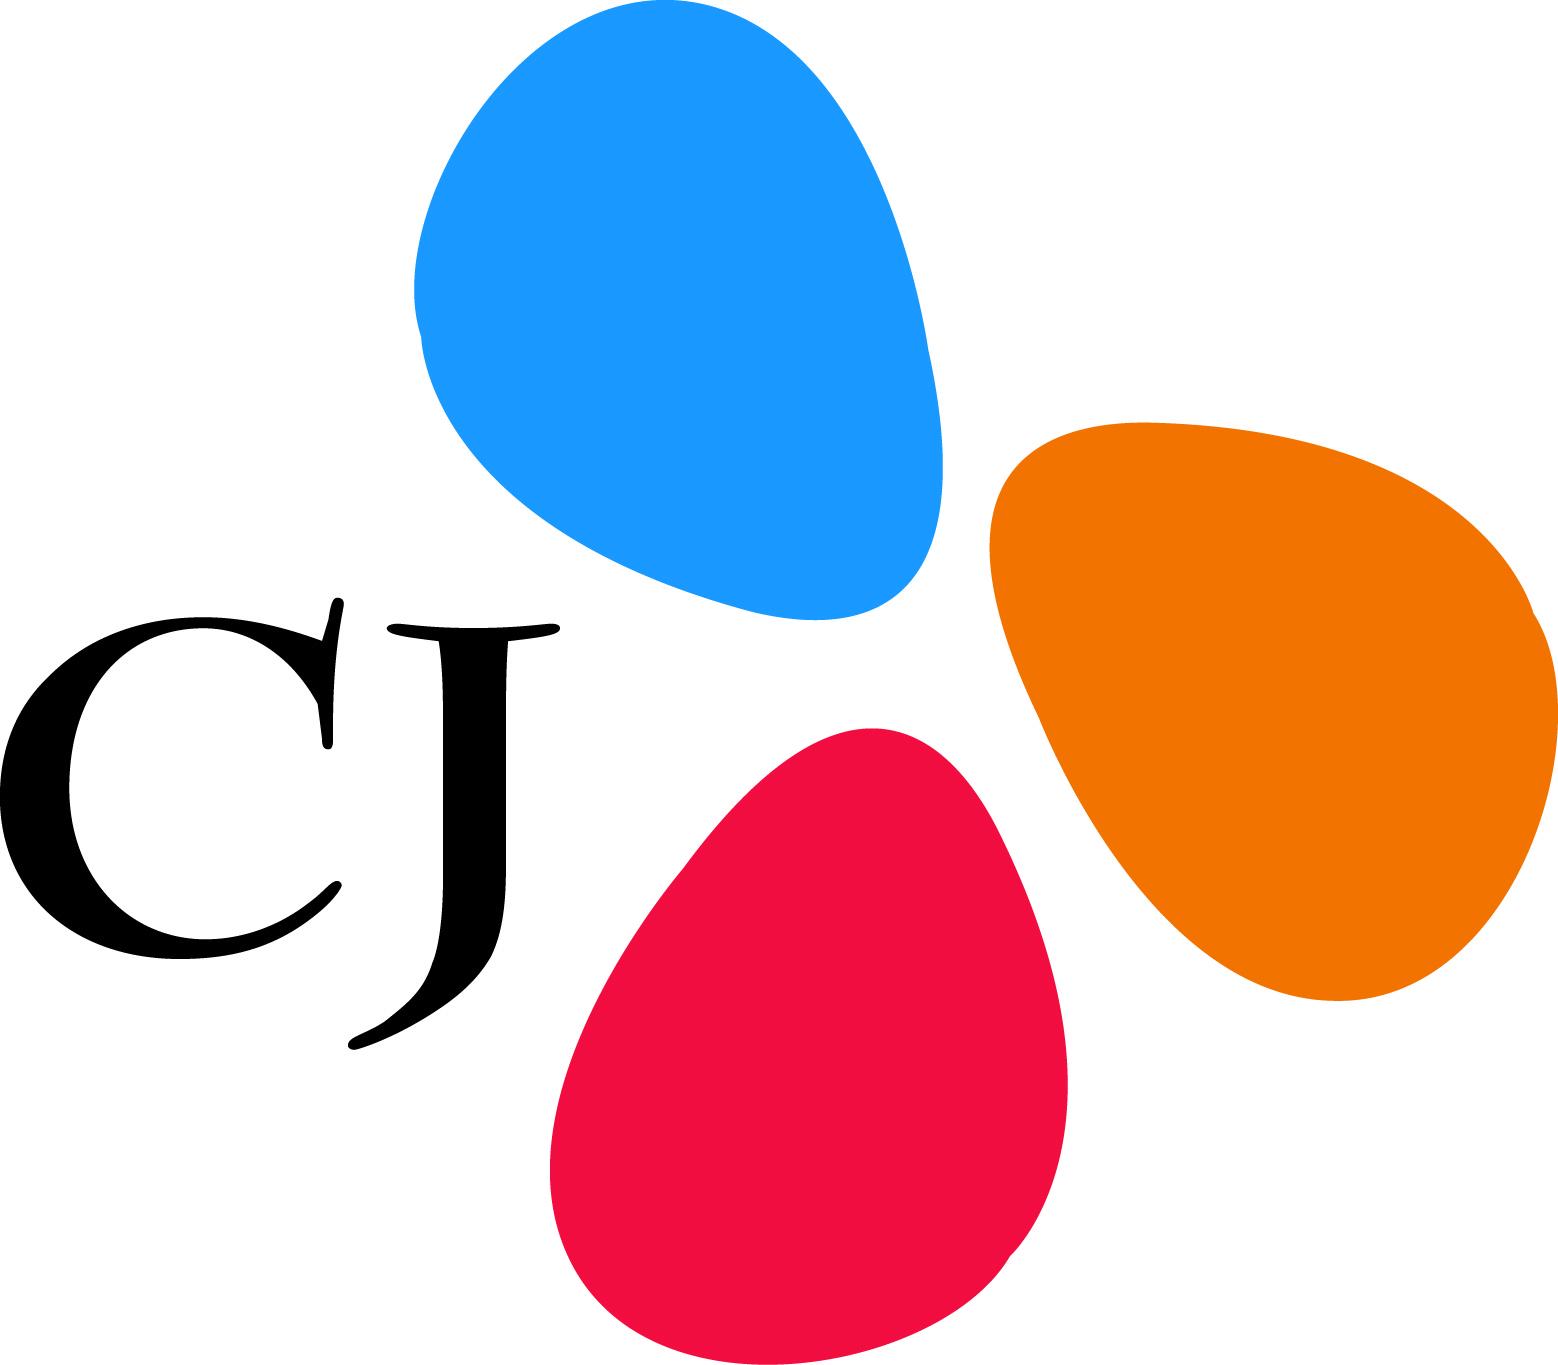 cj 171 logos amp brands directory